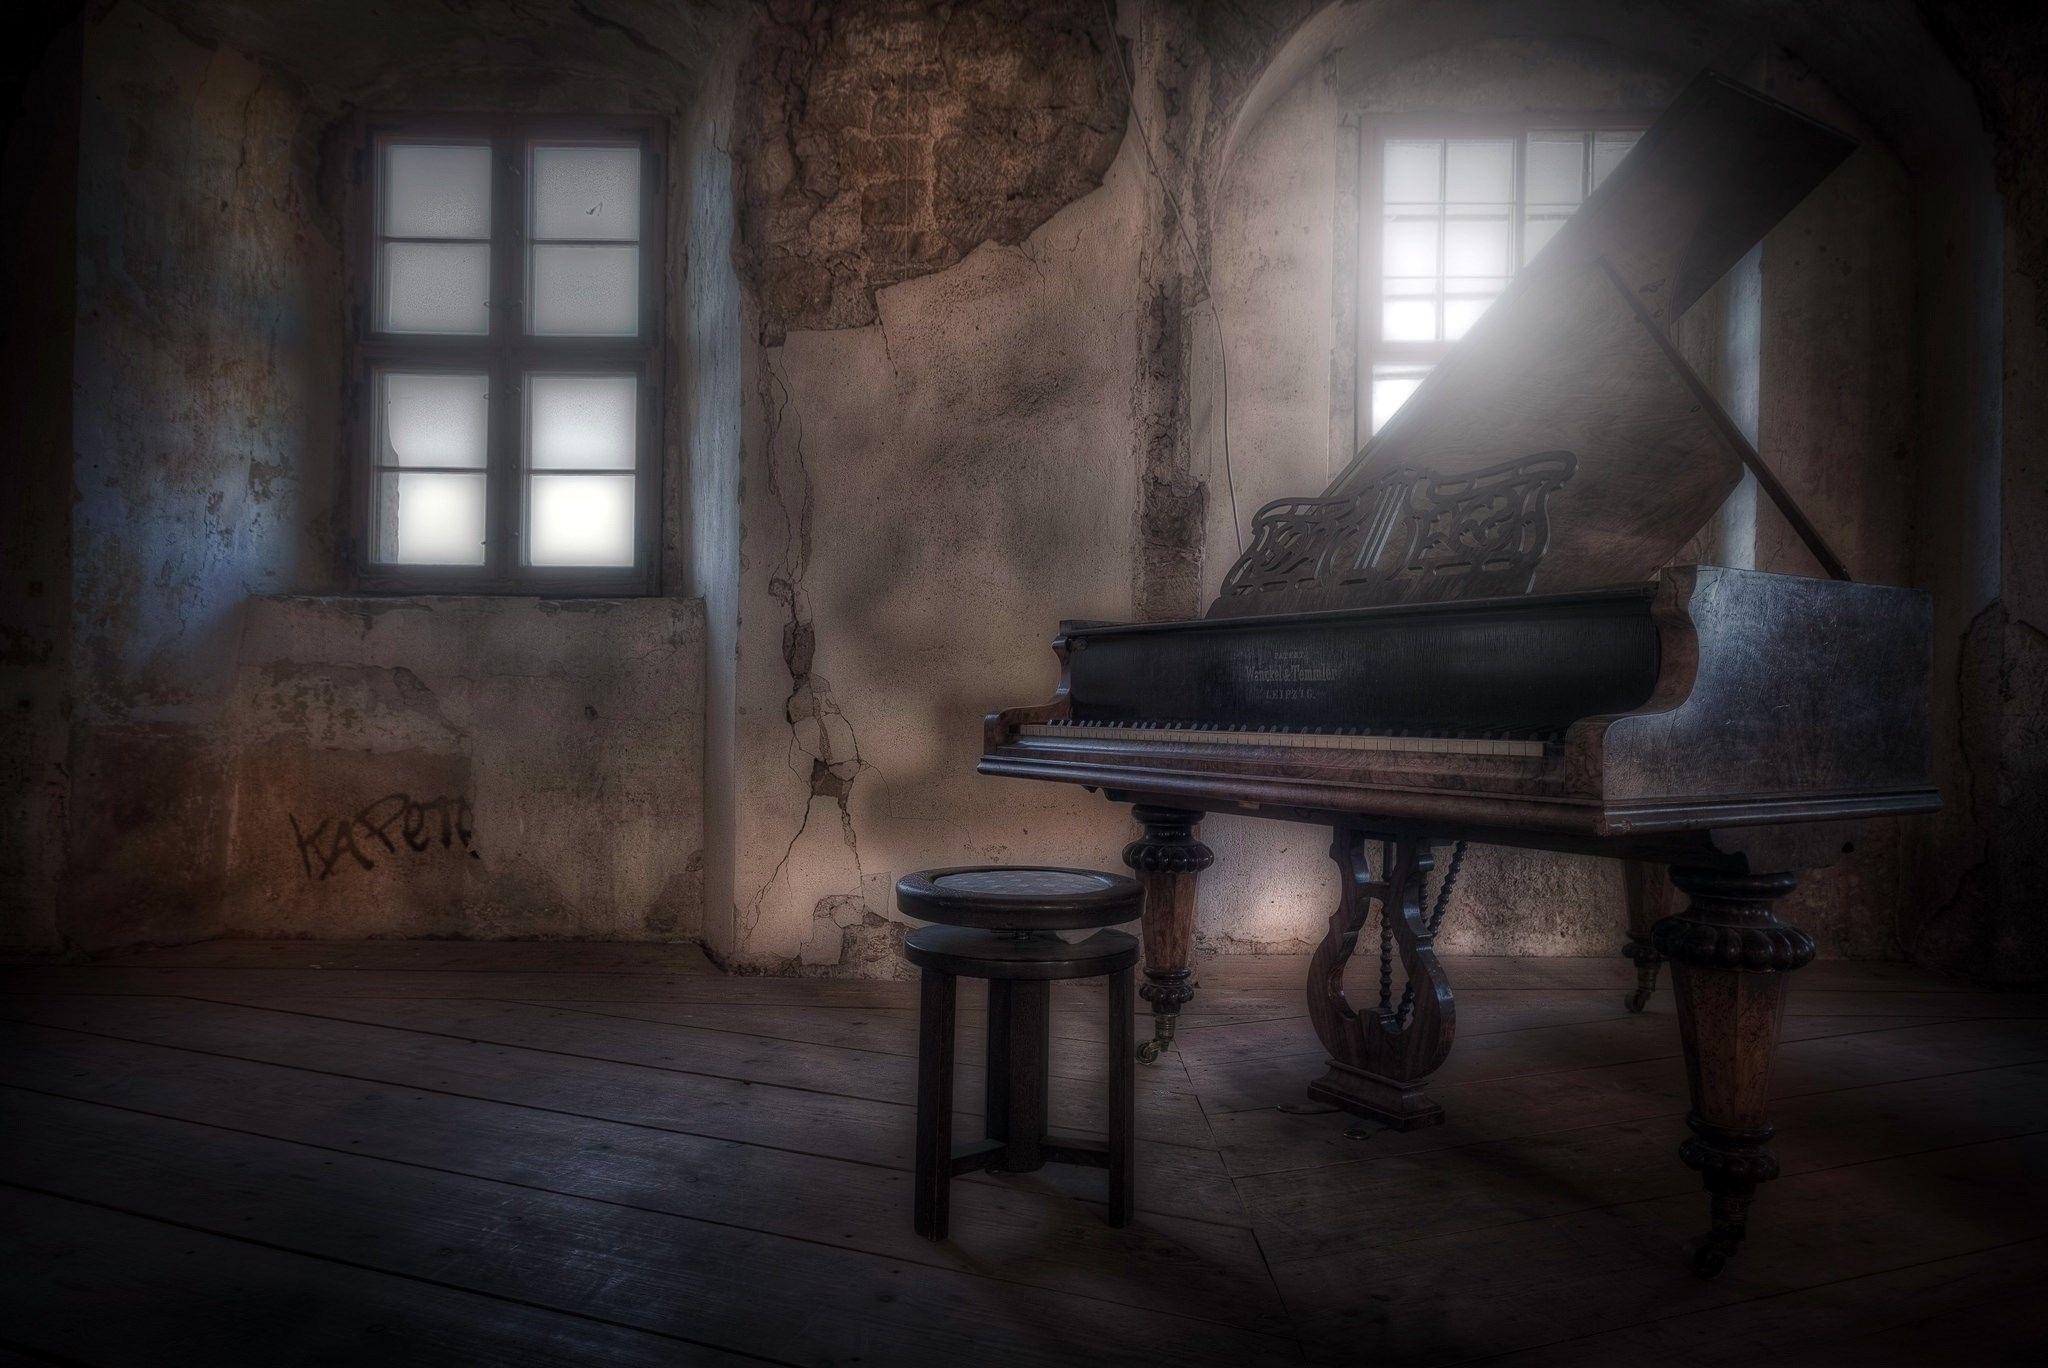 Backgrounds High Resolution Piano Wallpaper By Braylen Hardman 2017 03 06